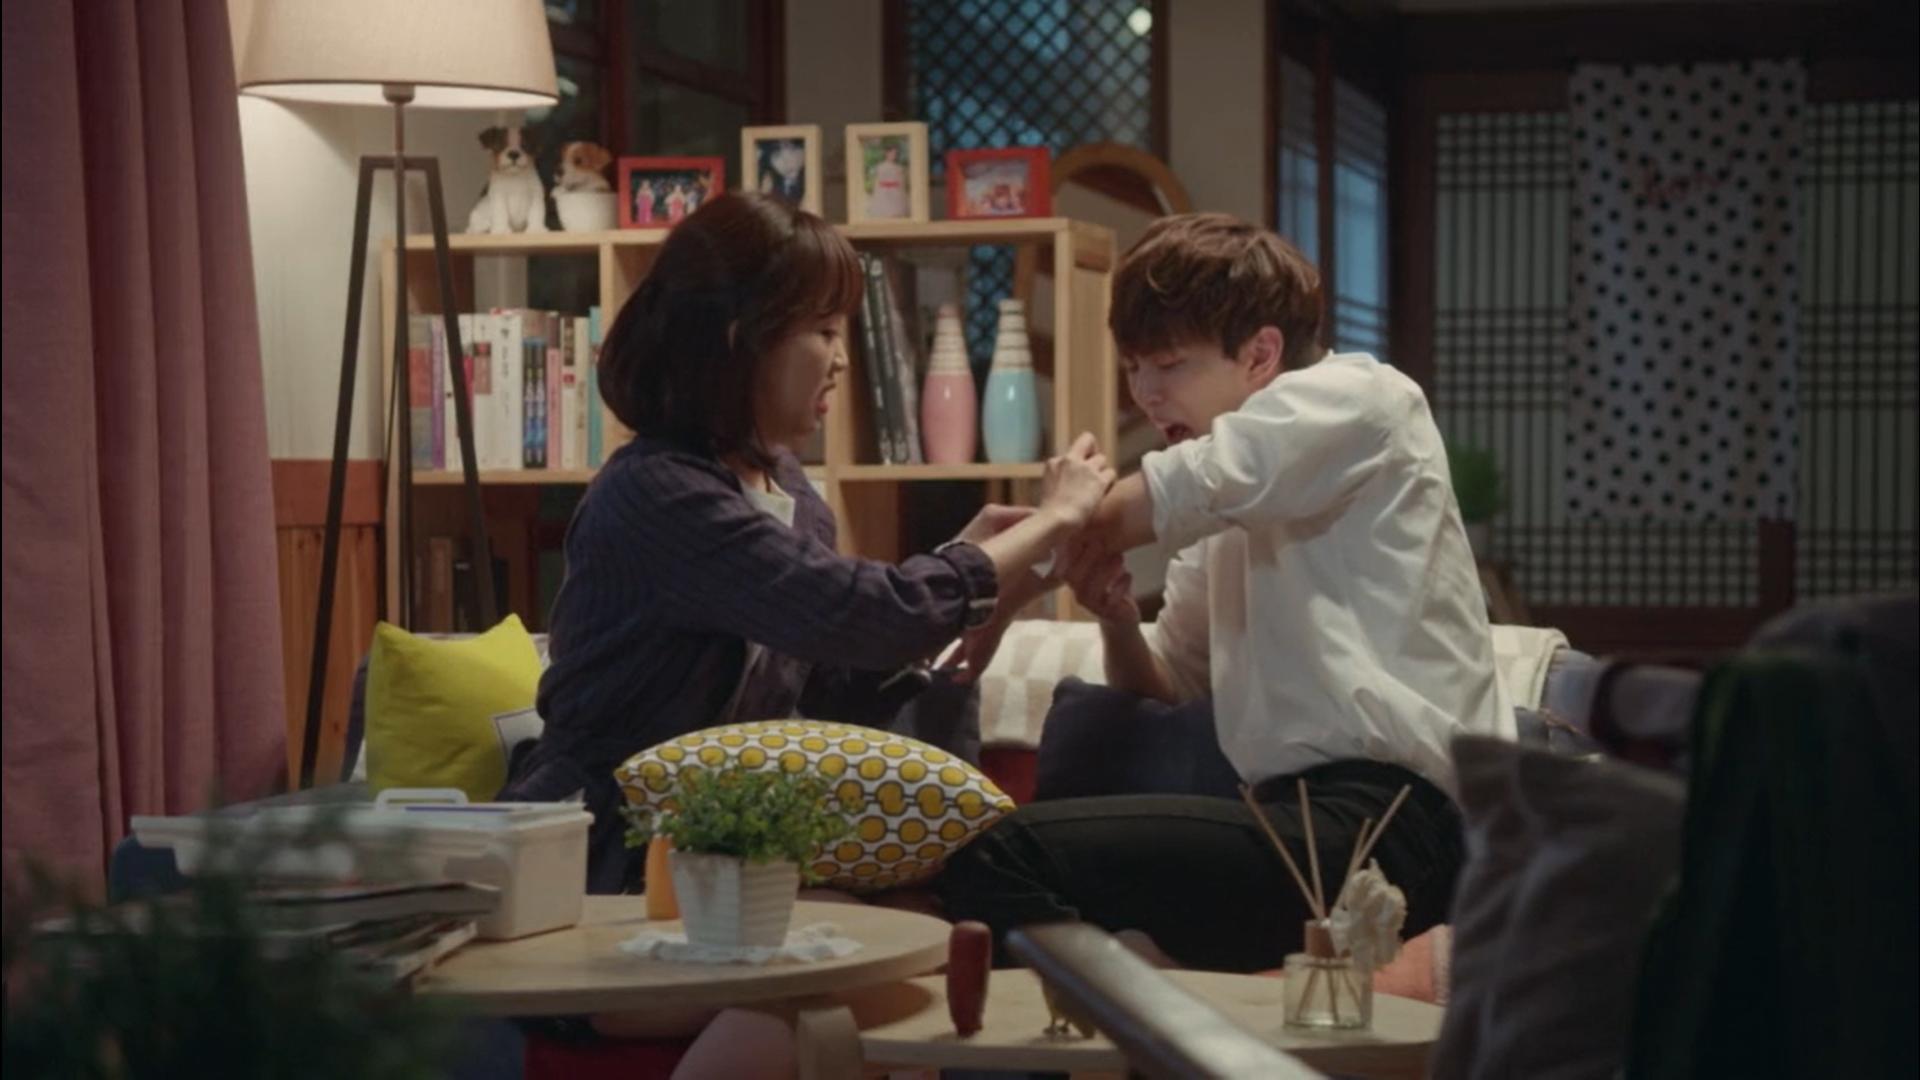 Wednesday 3:30 PM Seon Eun-woo helping Yoon Jae-won after his fall